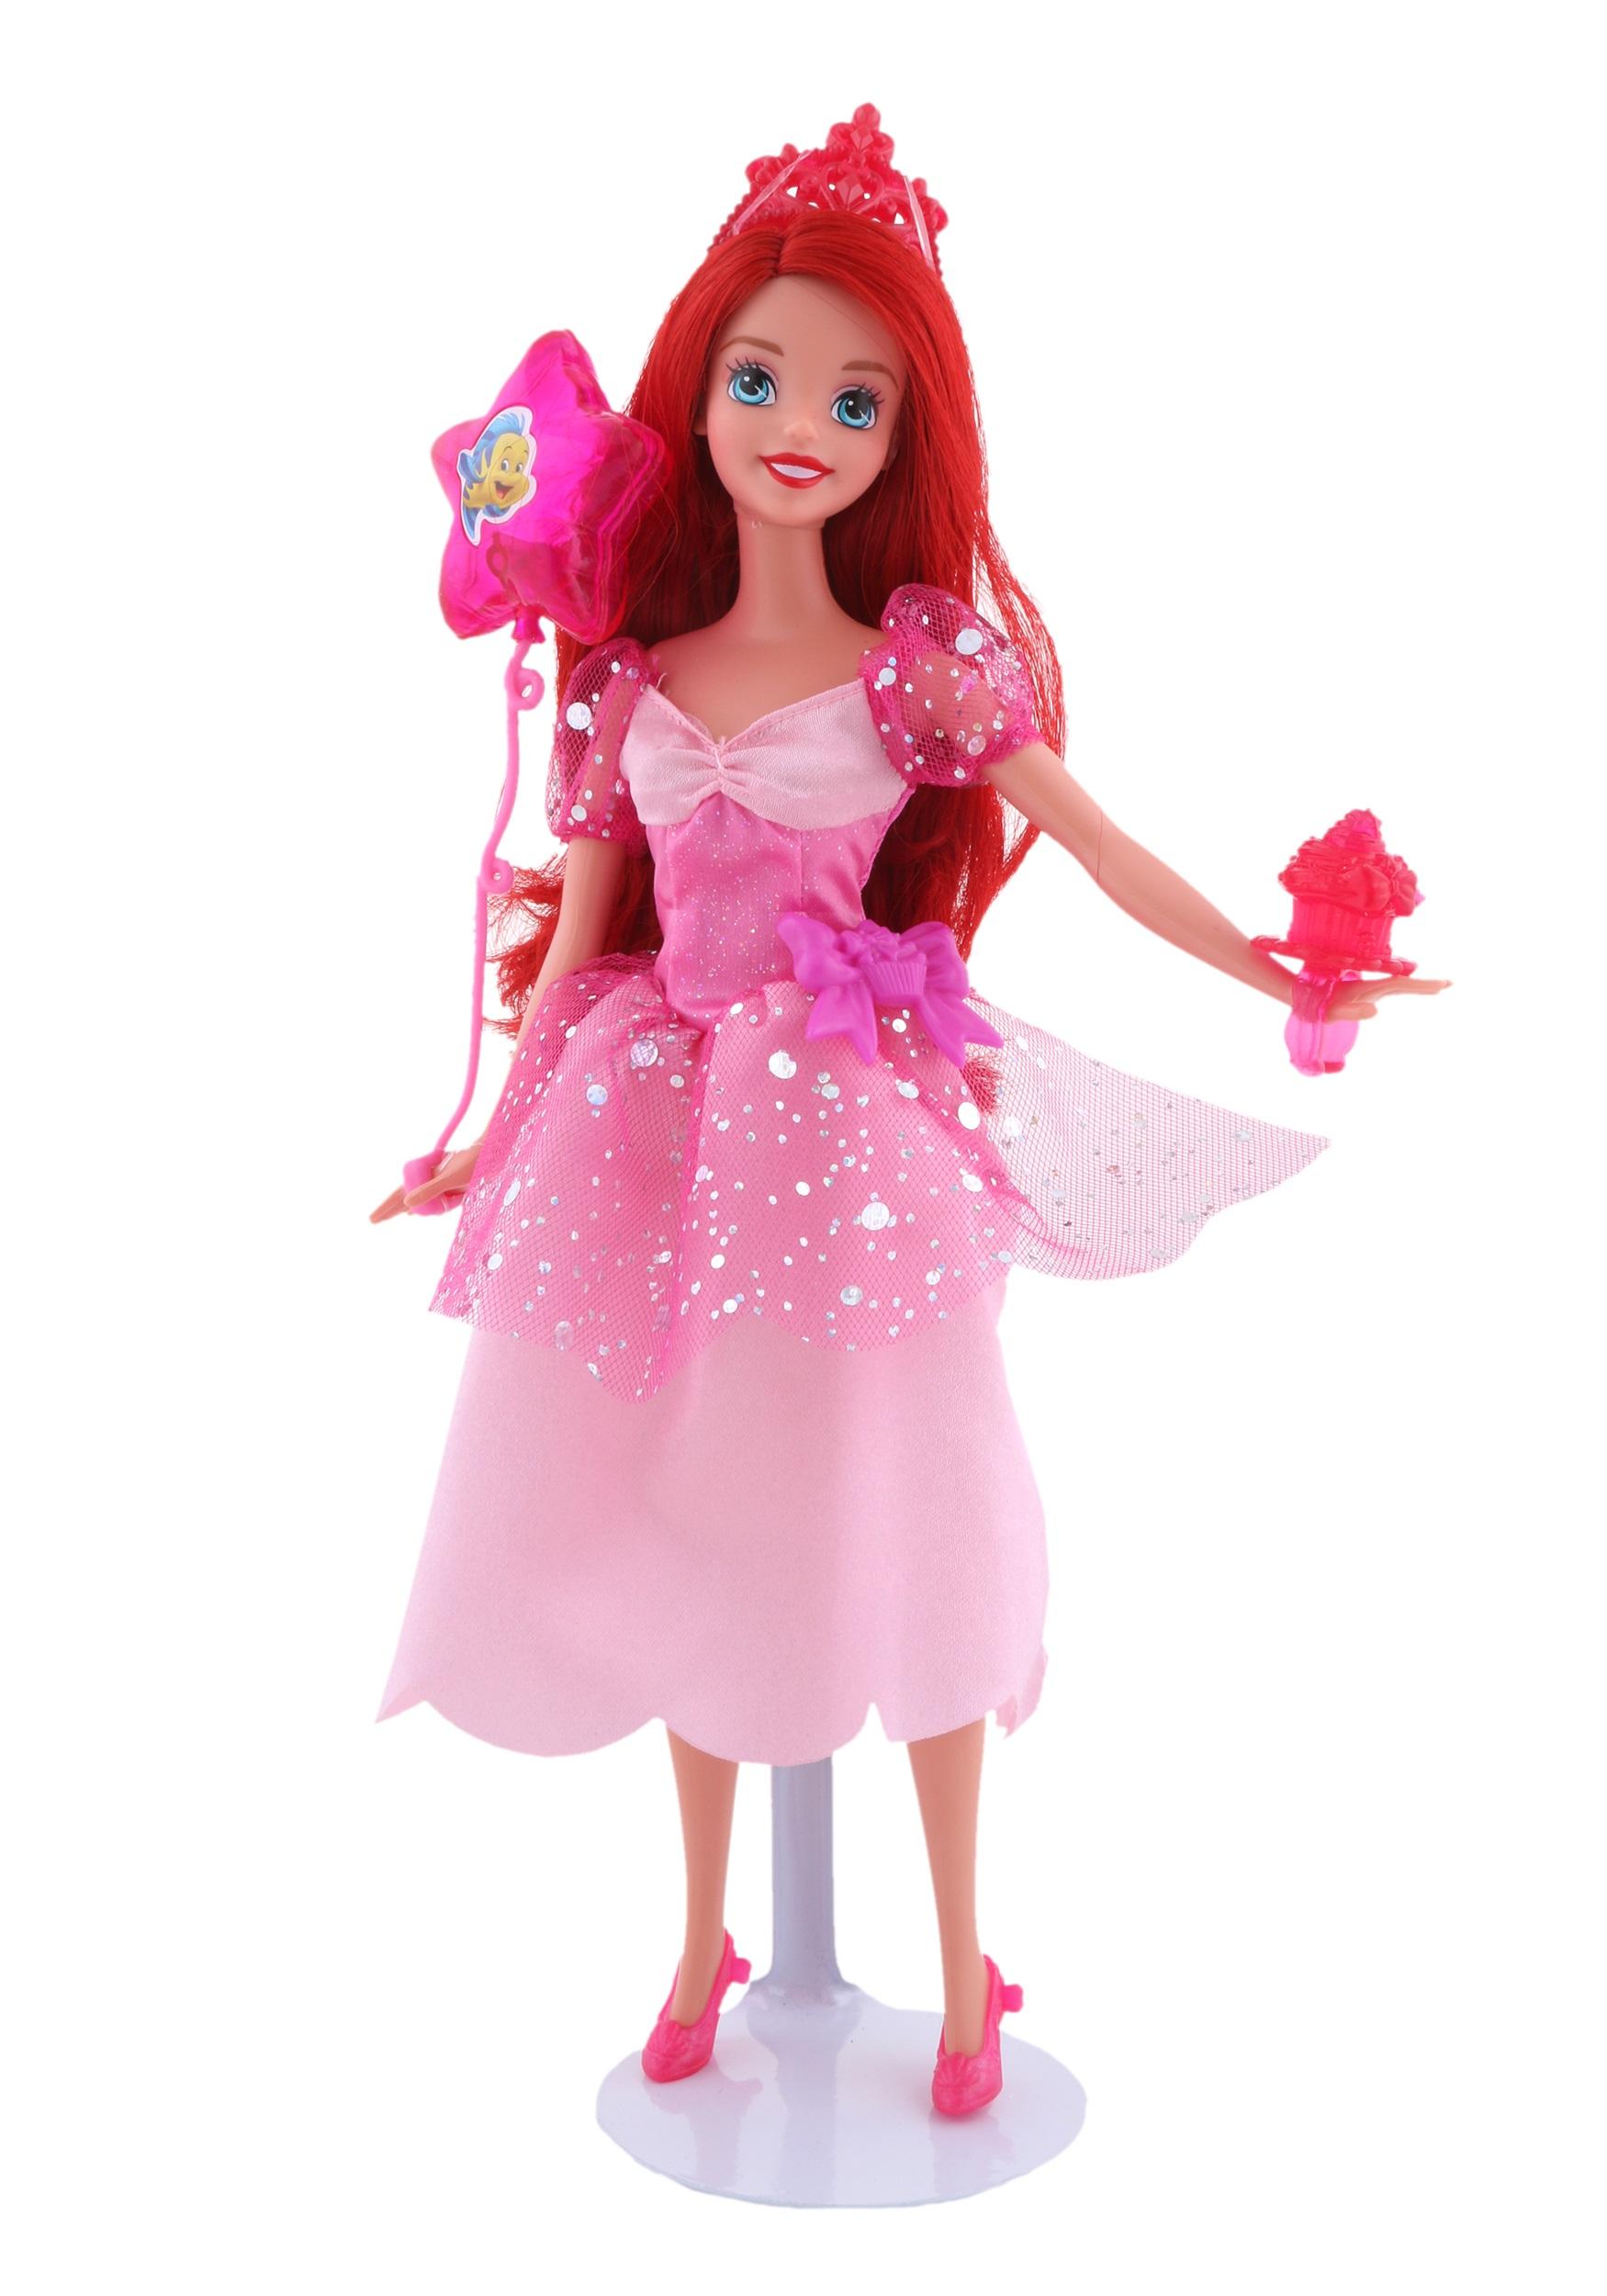 Disney Party Princess Ariel Doll